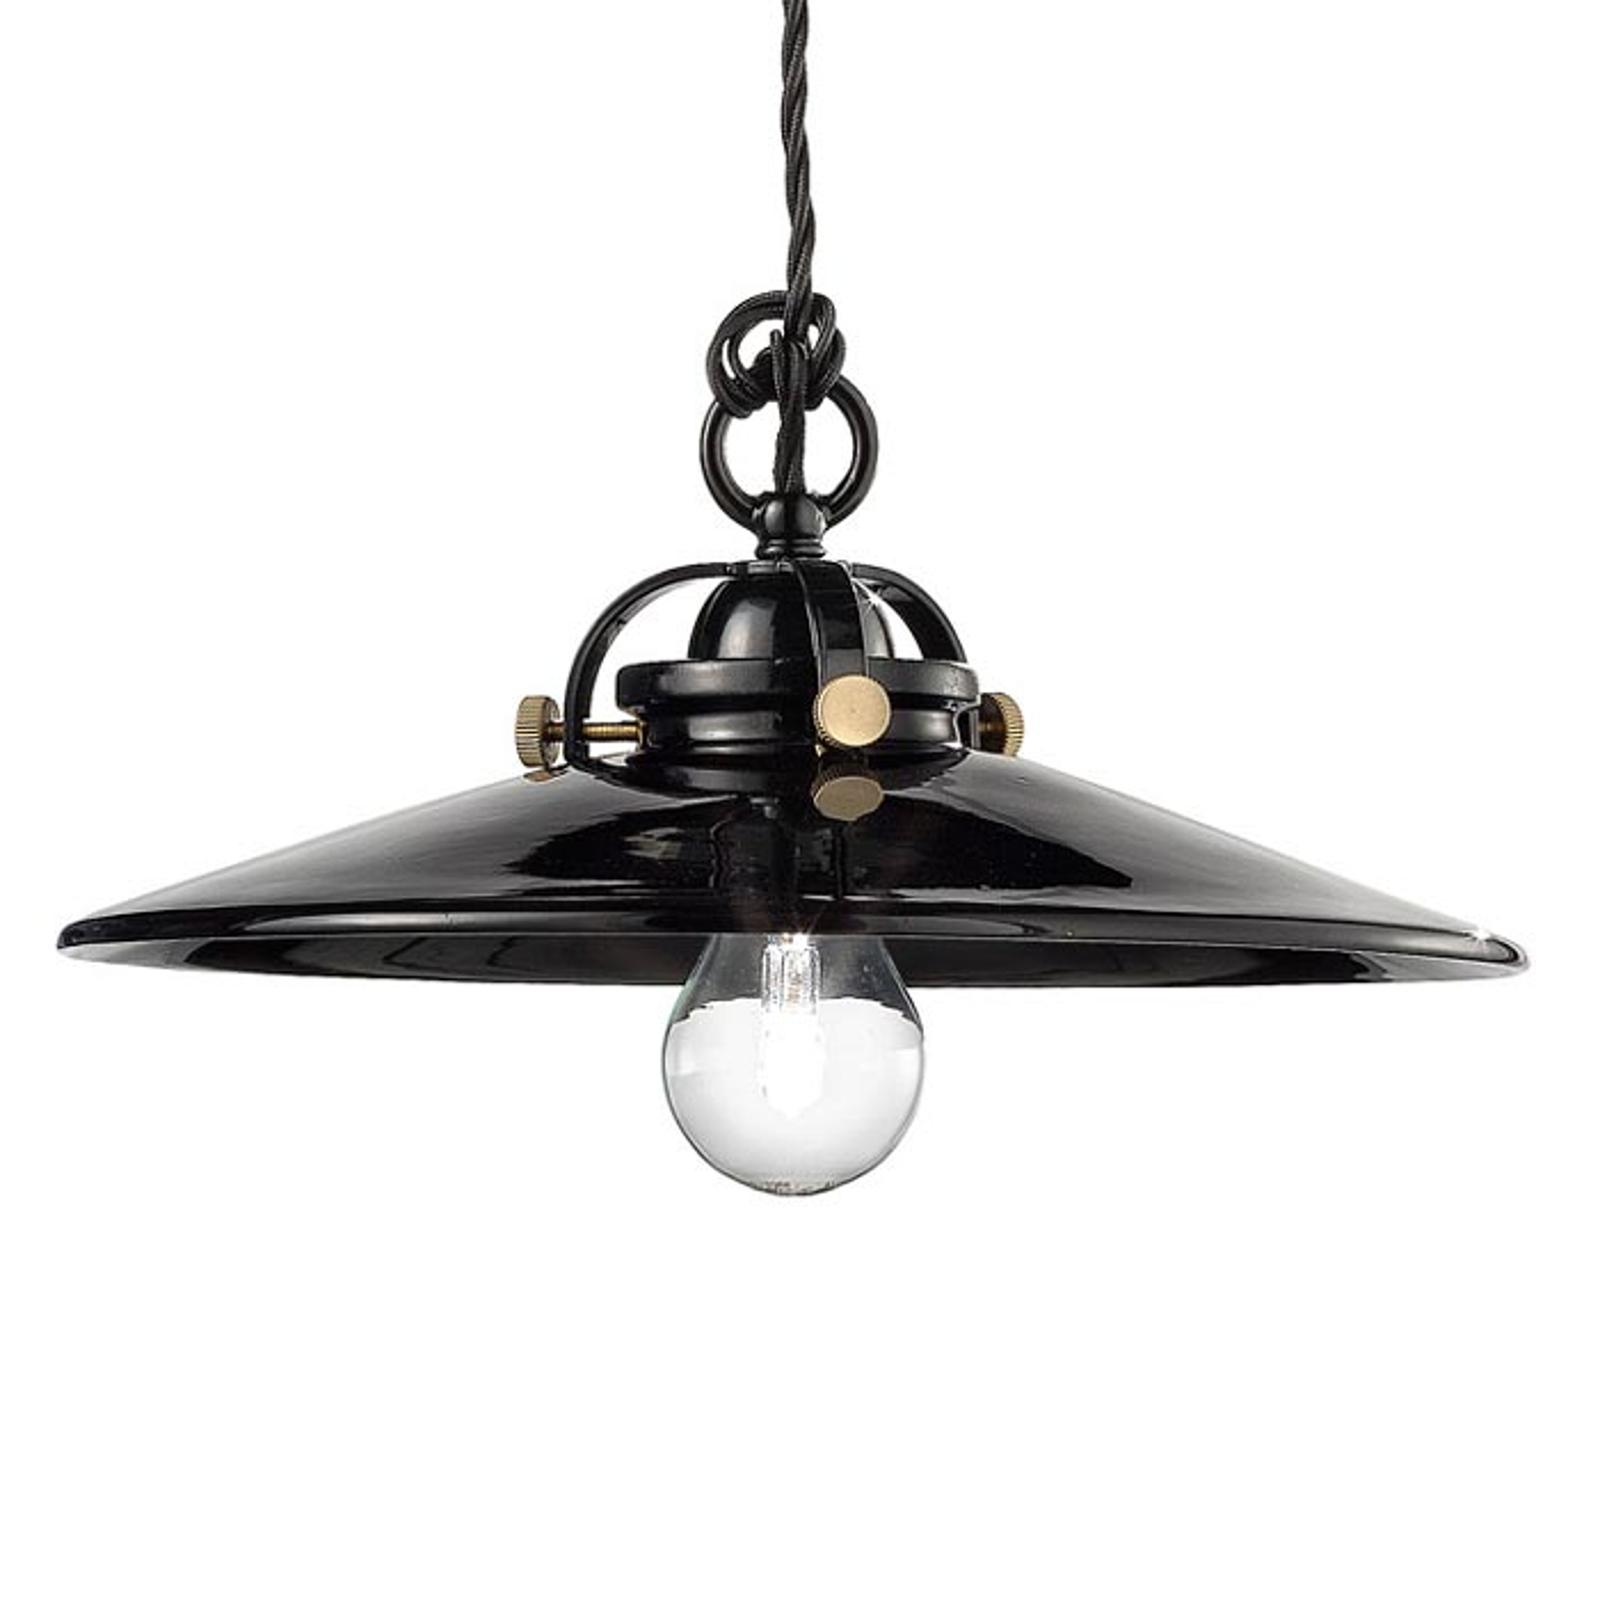 Edoardo black ceramic hanging light, 31cm_3517155_1